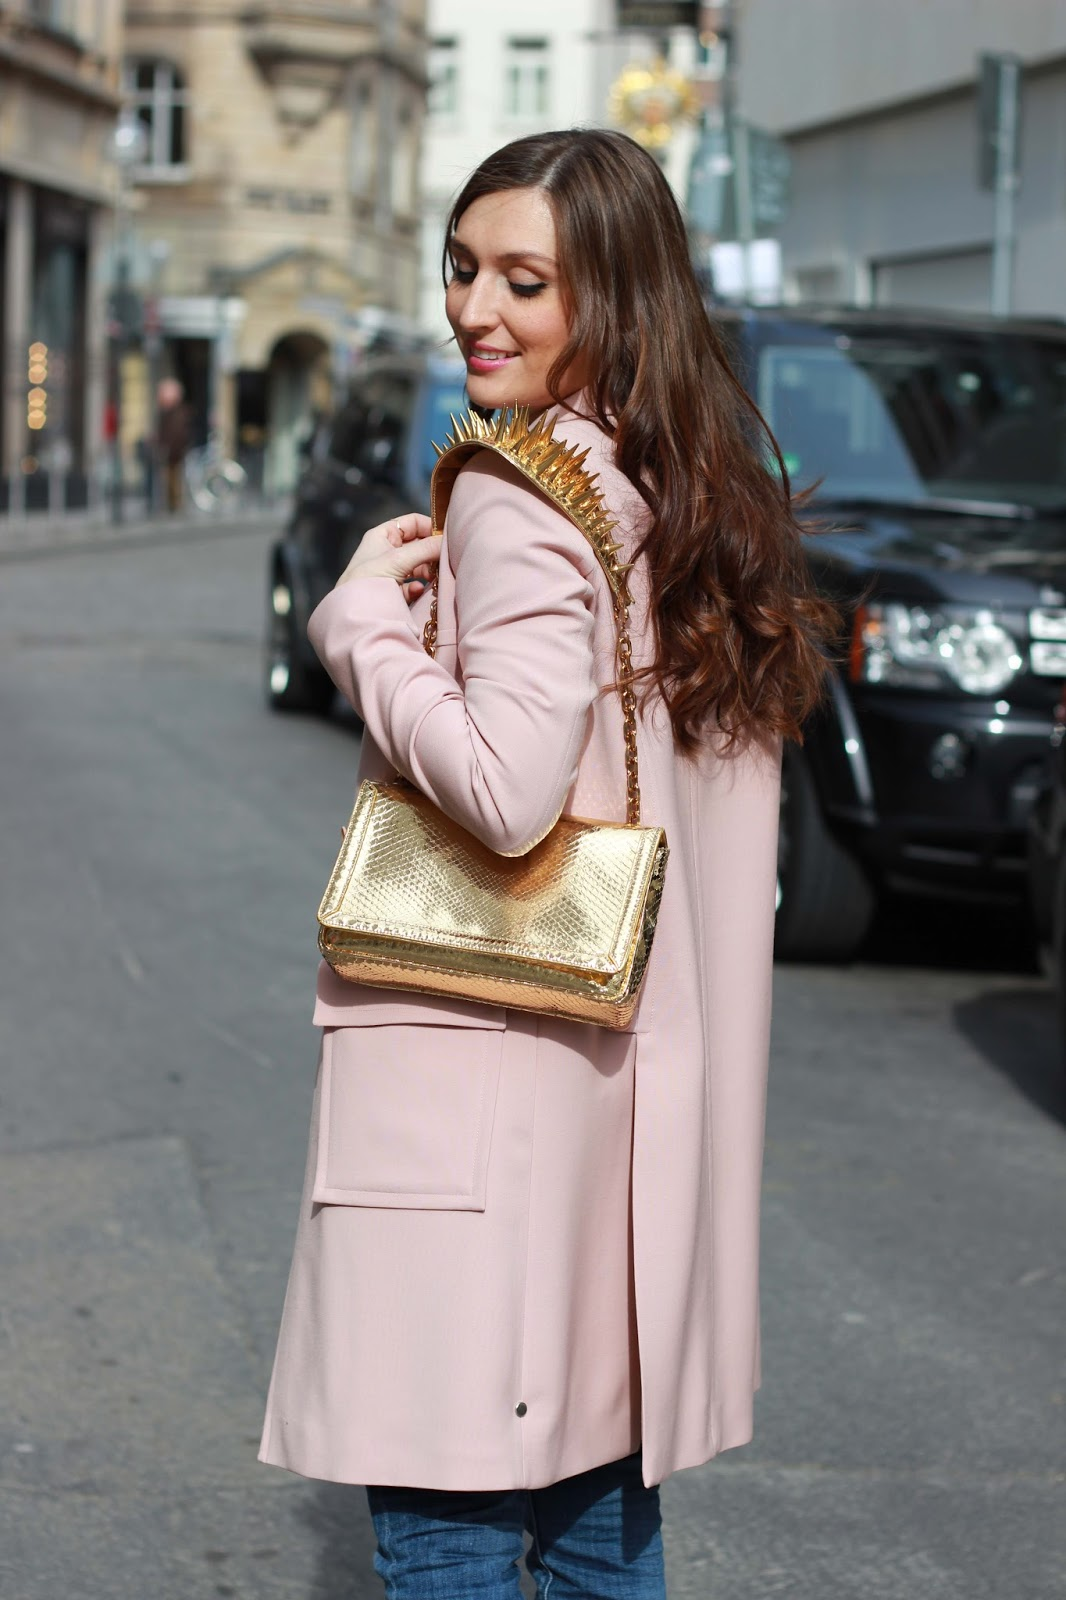 YSL Jacke- Streetstyleinspiration - Fashionstylebyjohanna - Modeblogger - Fashionblogger aus Deutschland - Deutsche Fashionblogger - Lou